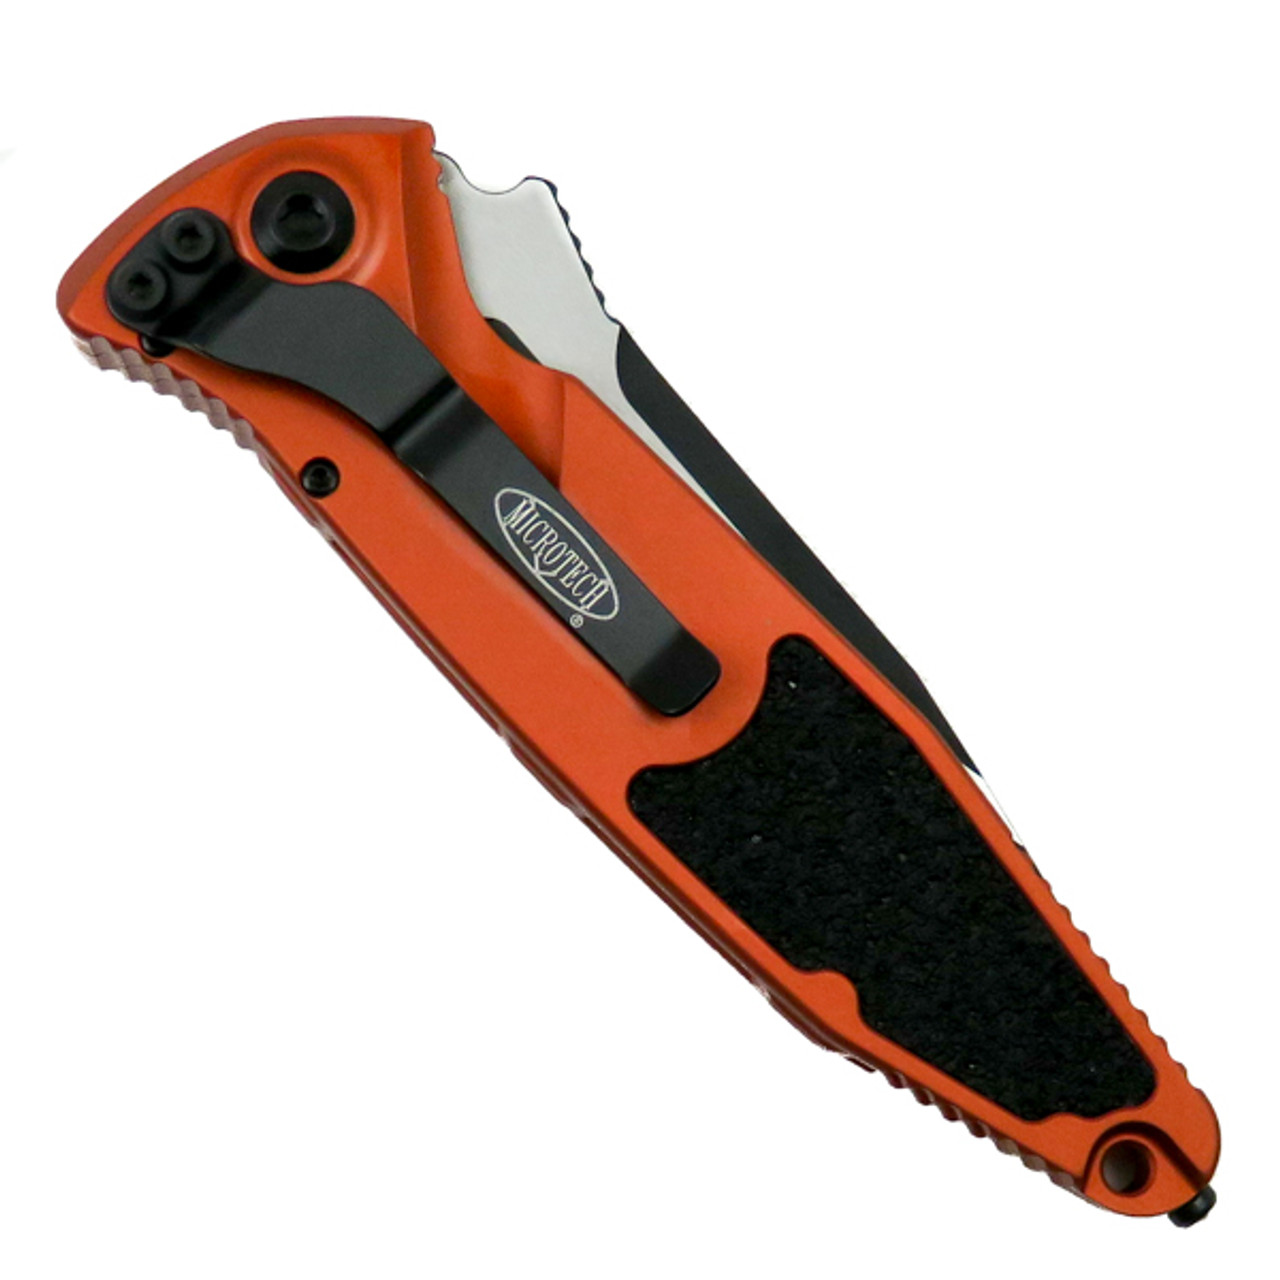 Microtech Orange Socom Elite Auto Knife, Black Blade Back